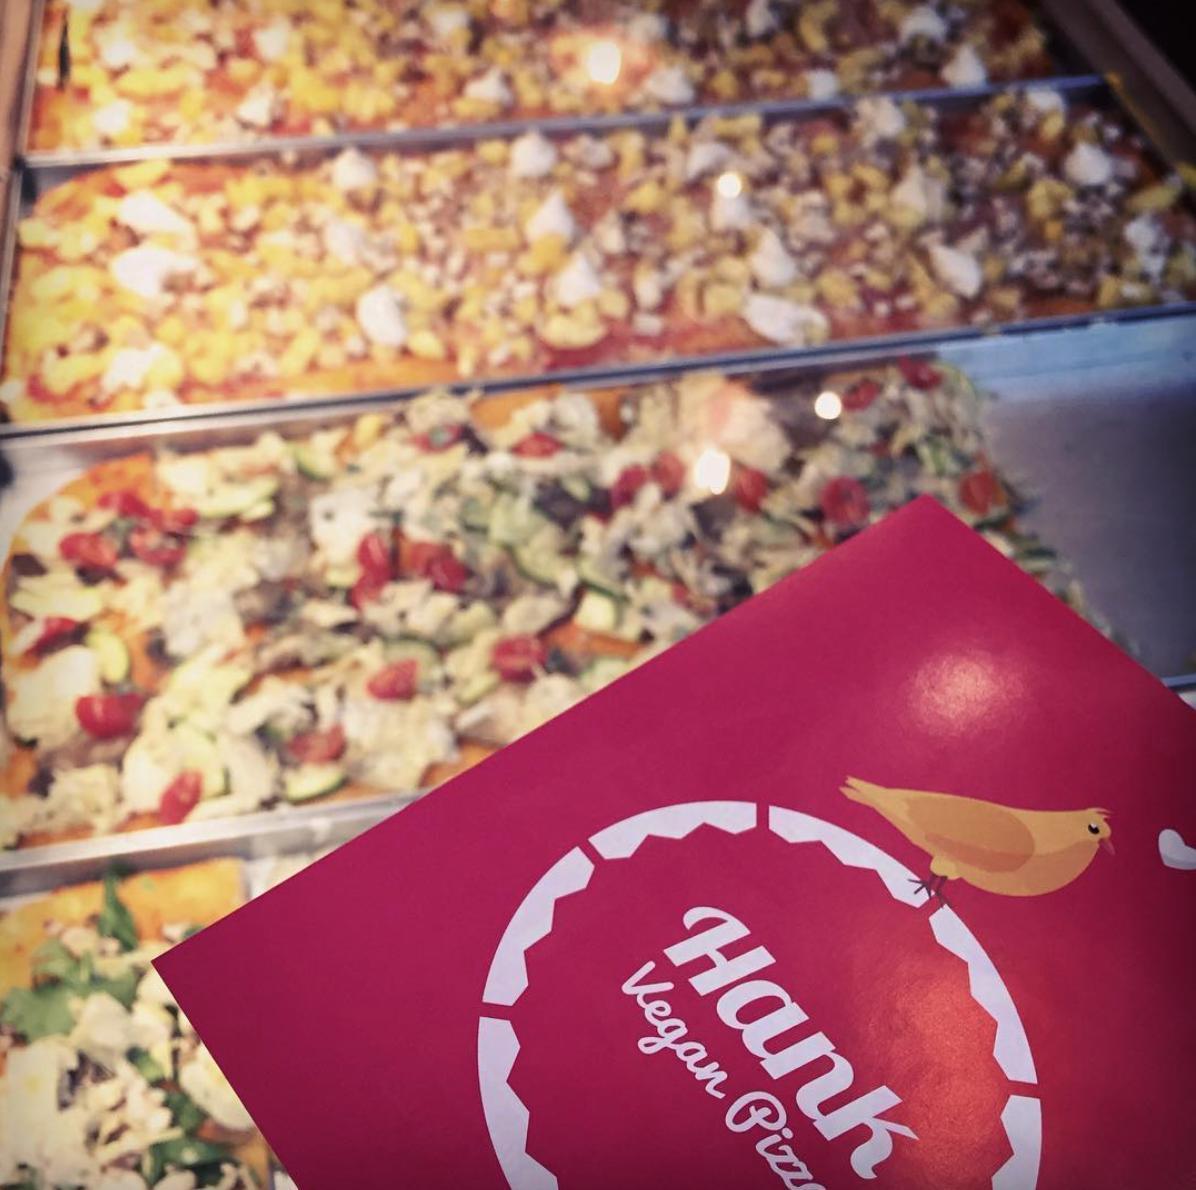 troc de troc menus hank pizza vegan image 1